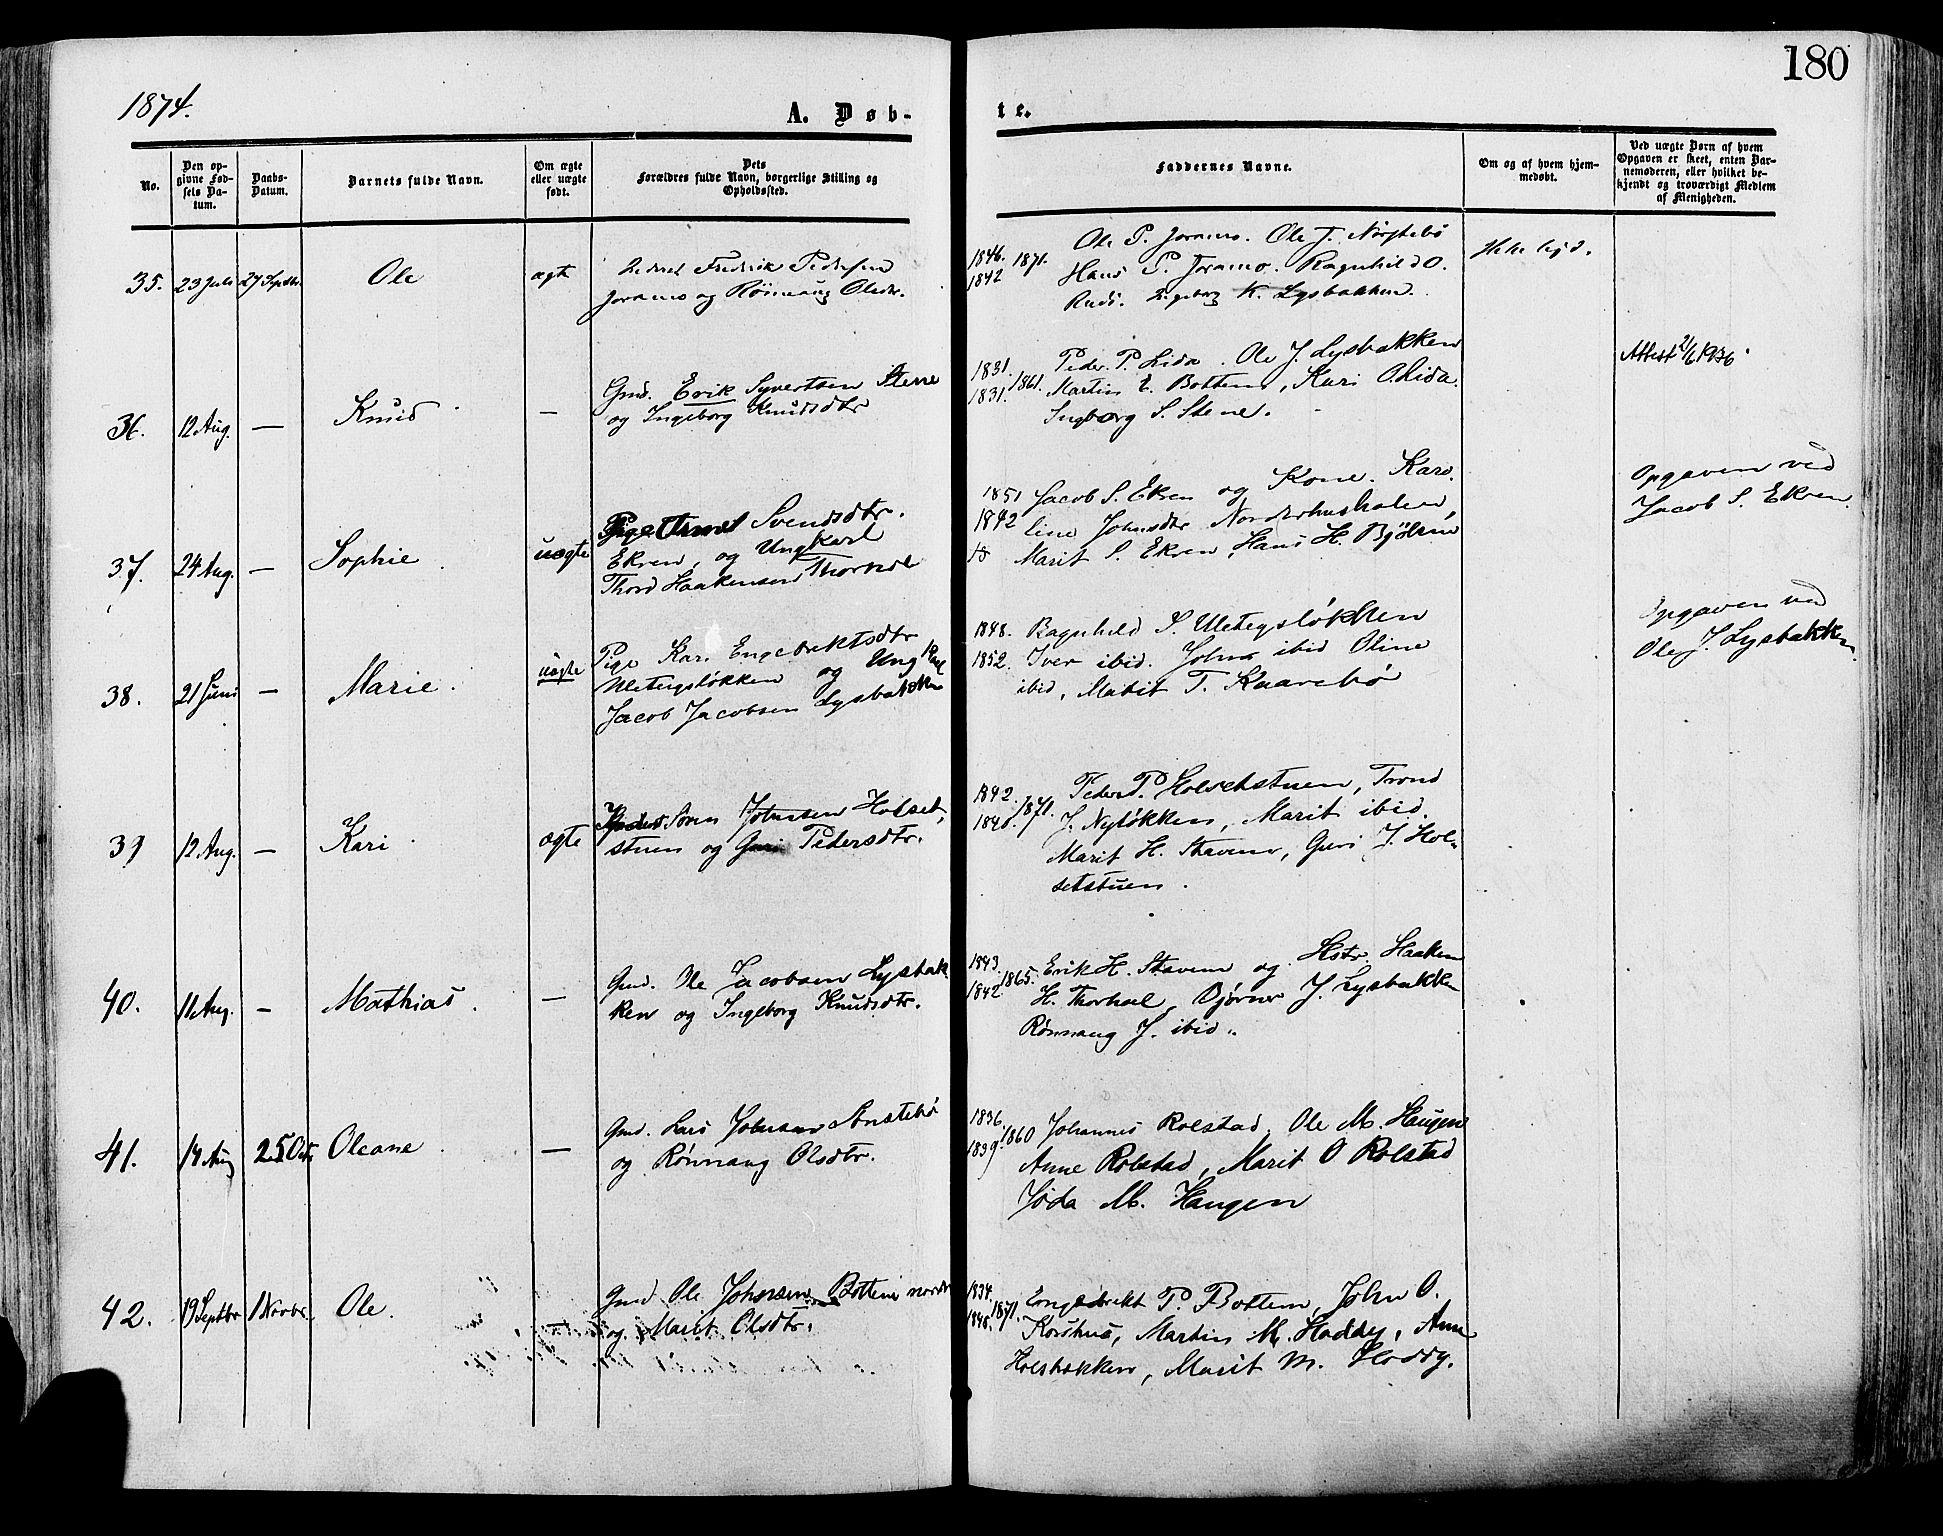 SAH, Lesja prestekontor, Ministerialbok nr. 8, 1854-1880, s. 180